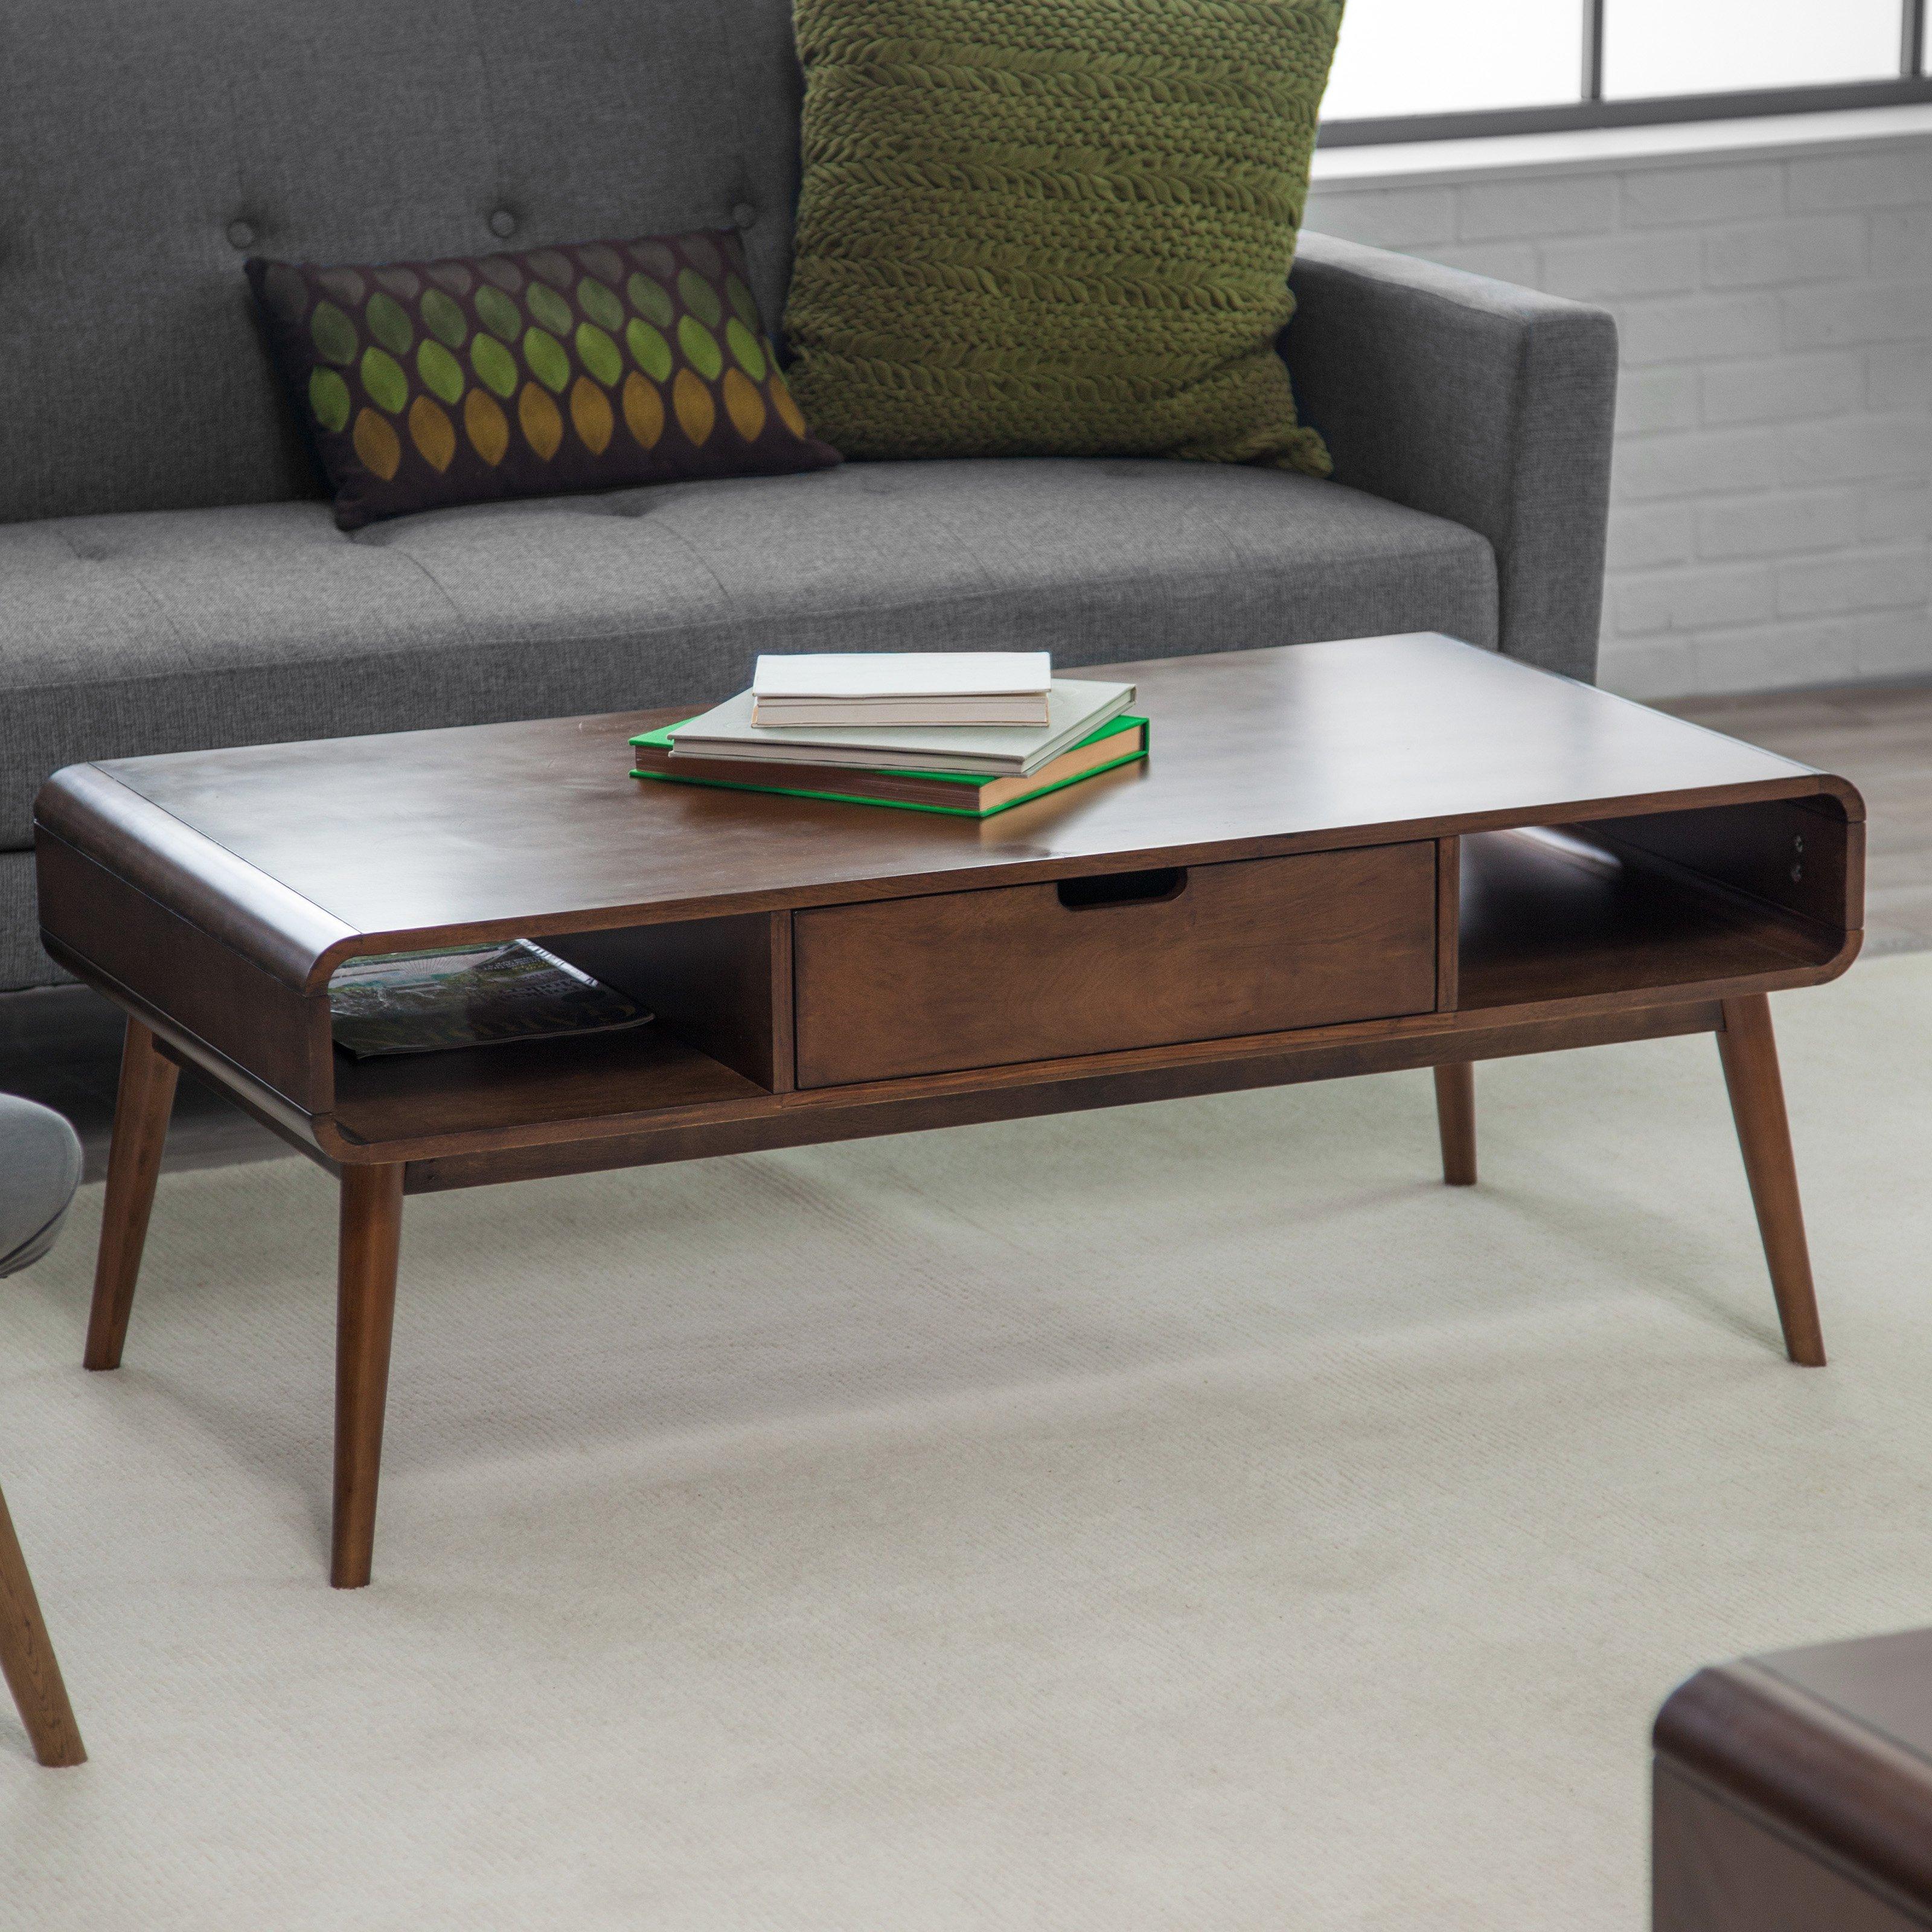 Belham Living Carter Mid Century Modern Coffee Table Hayneedle regarding dimensions 3200 X 3200